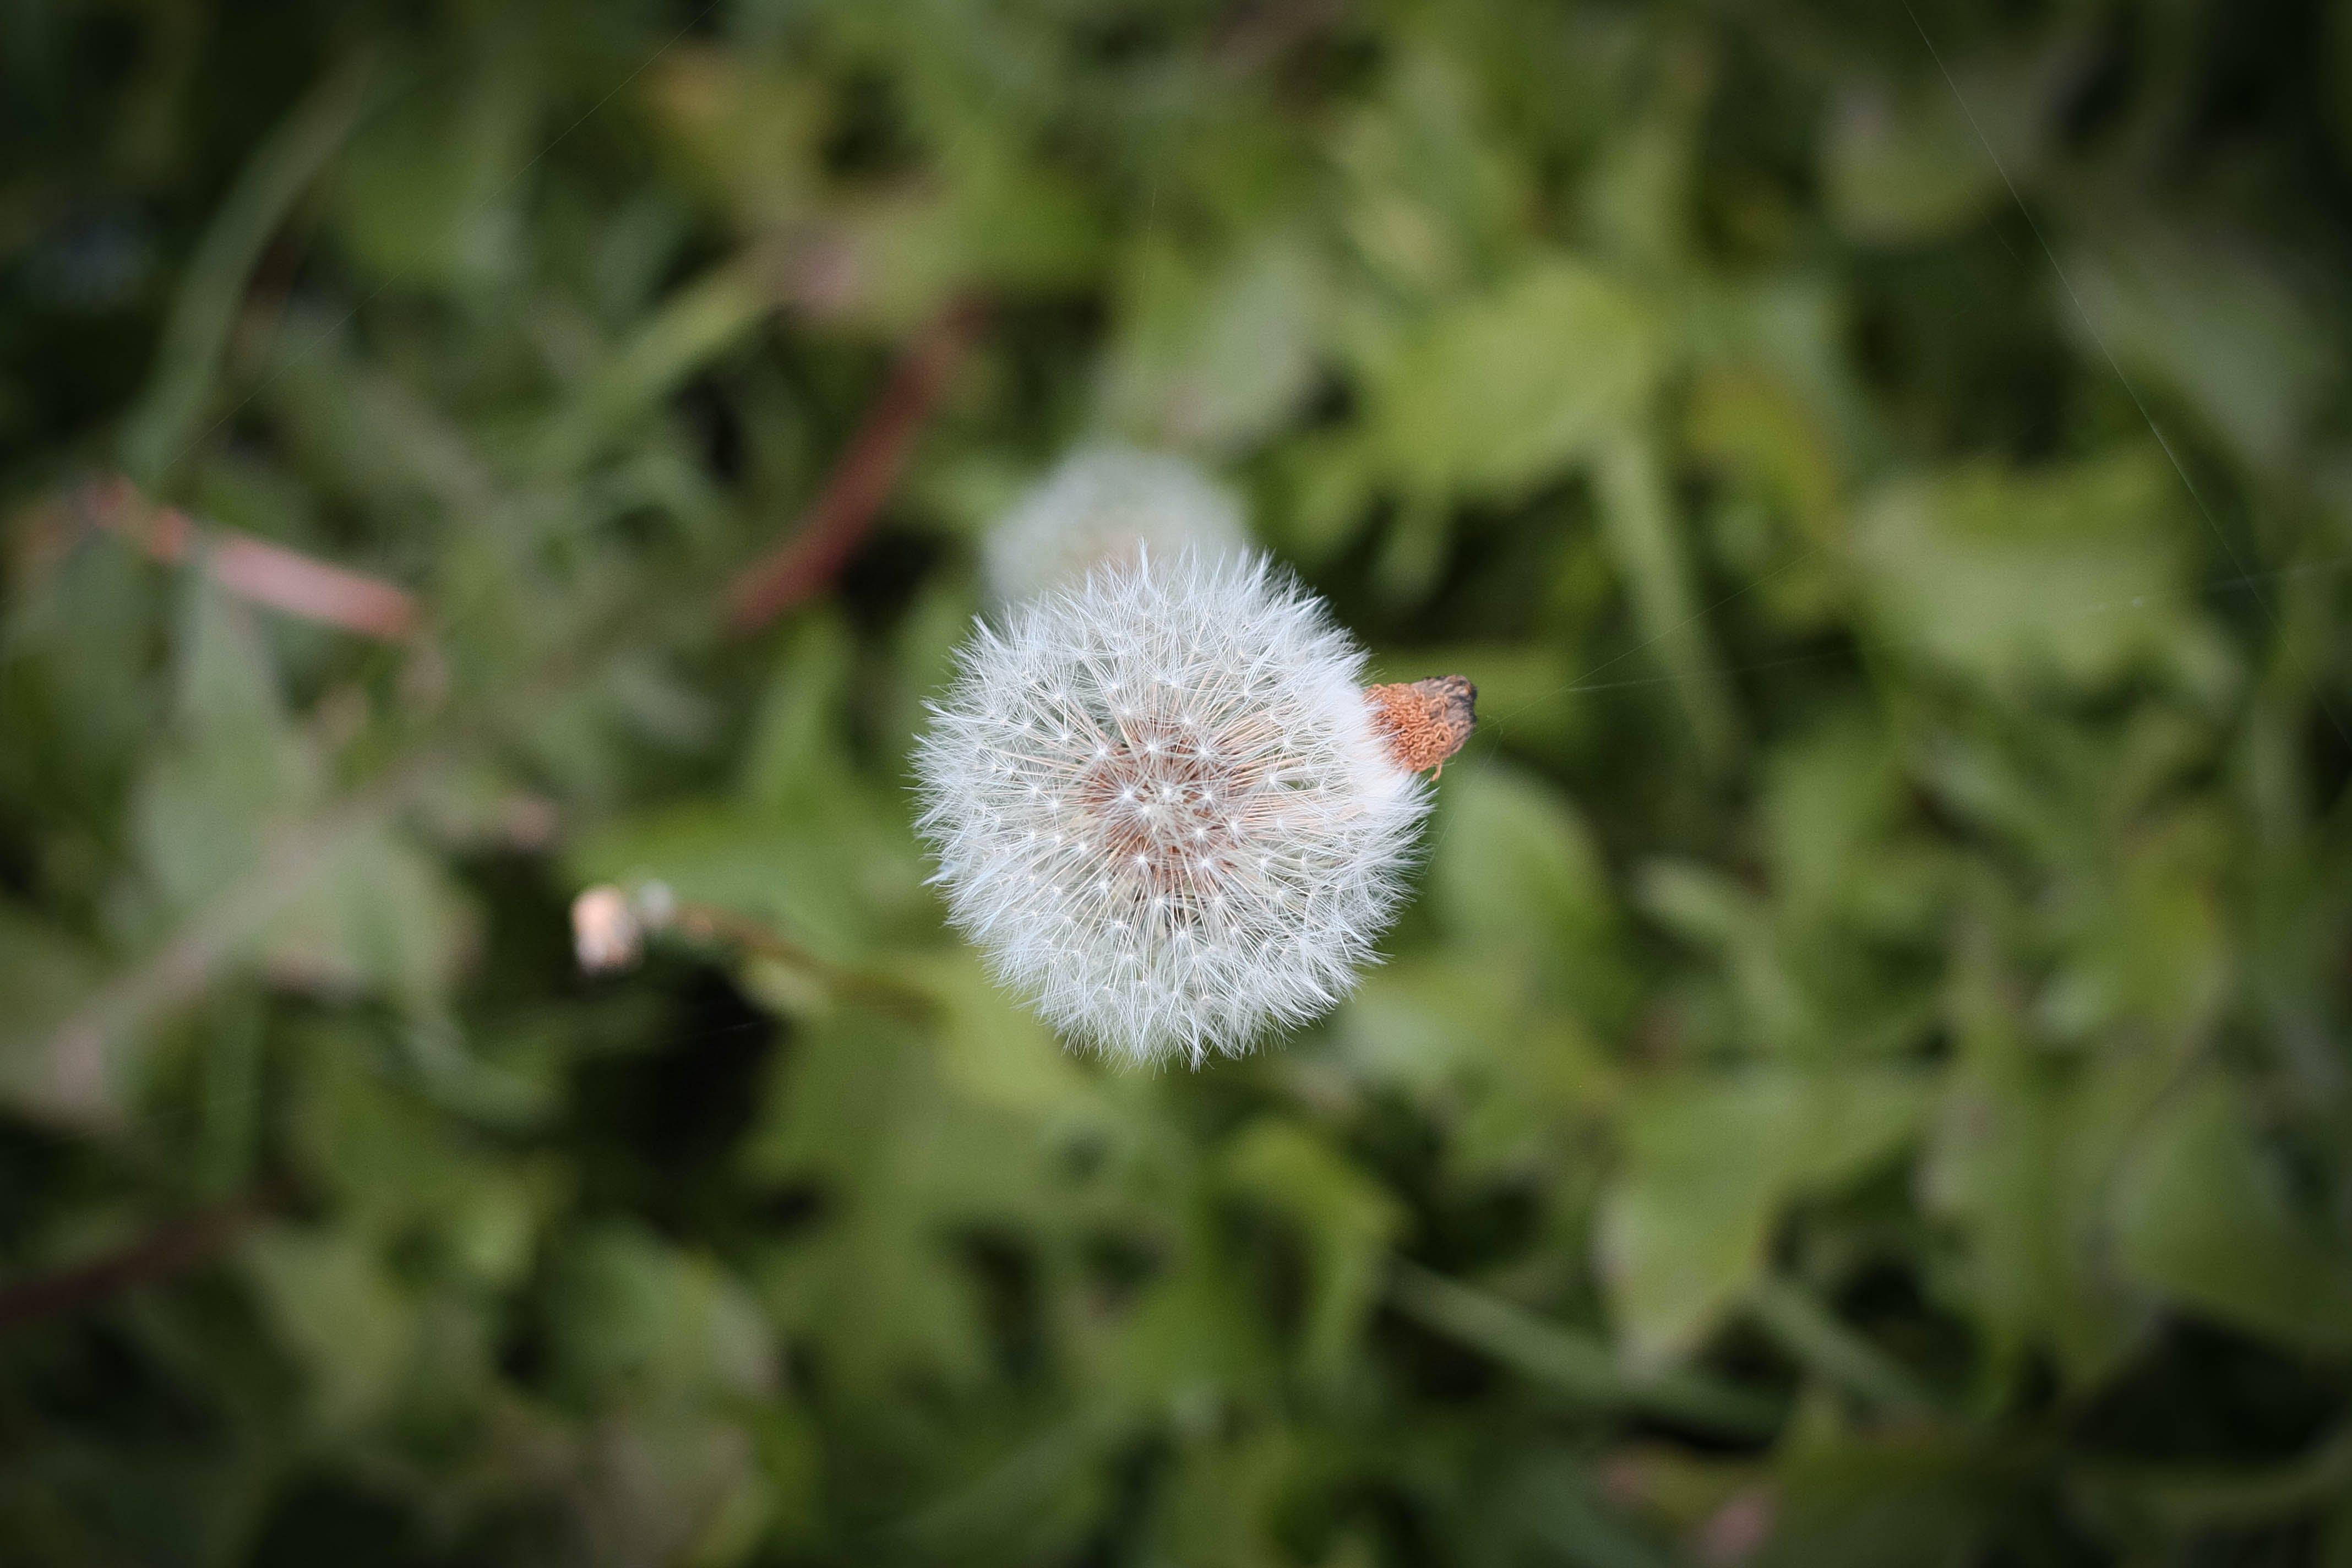 Free stock photo of dandelion, flowers, nature